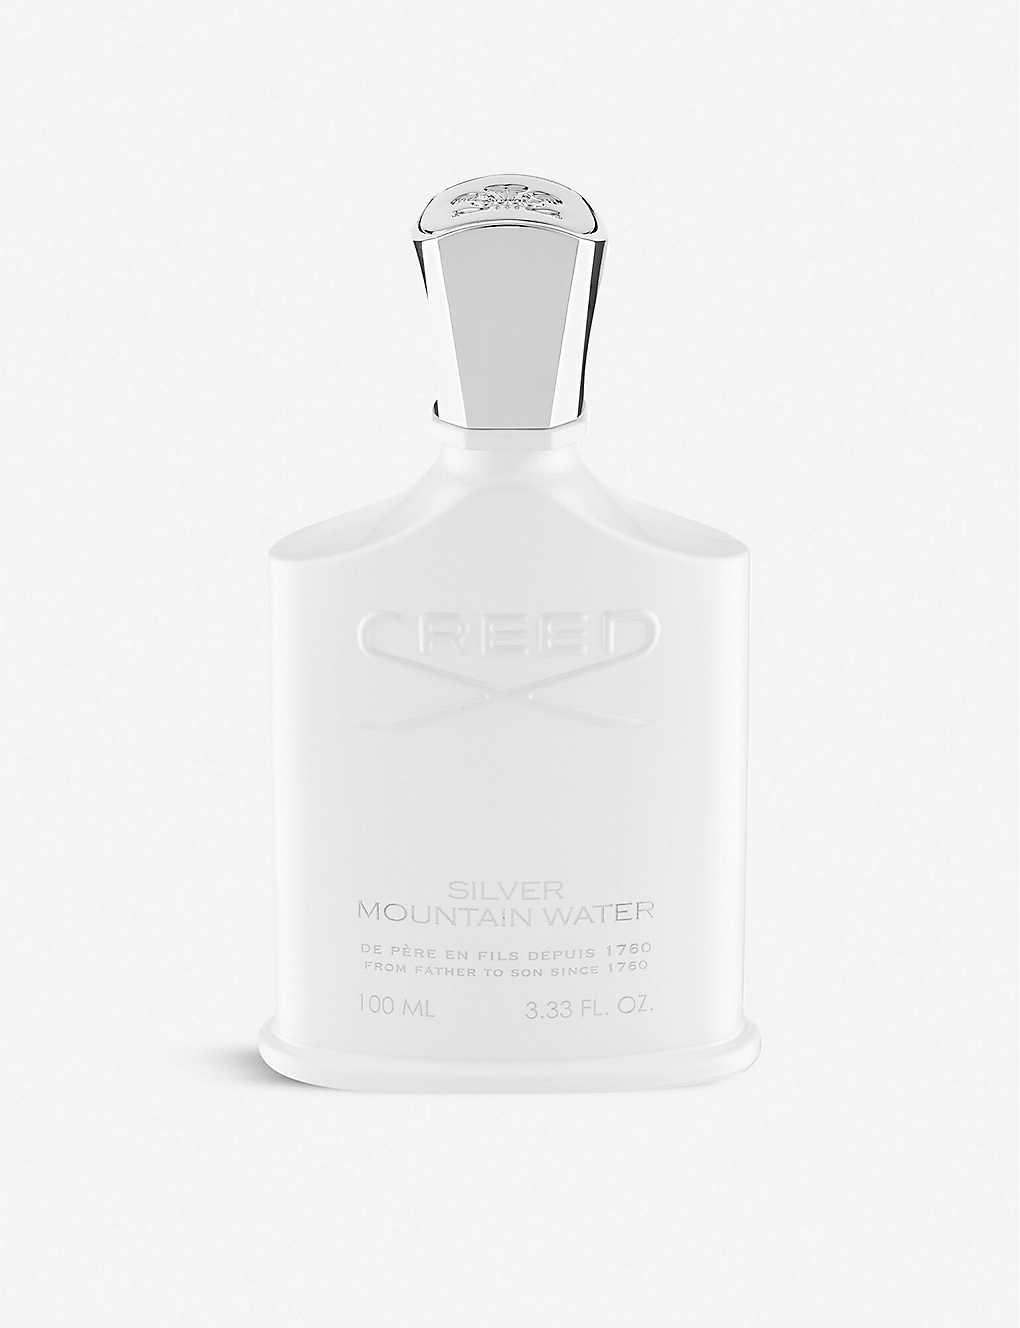 1f61085c9bd5 CREED - Silver Mountain Water eau de parfum 100ml   Selfridges.com